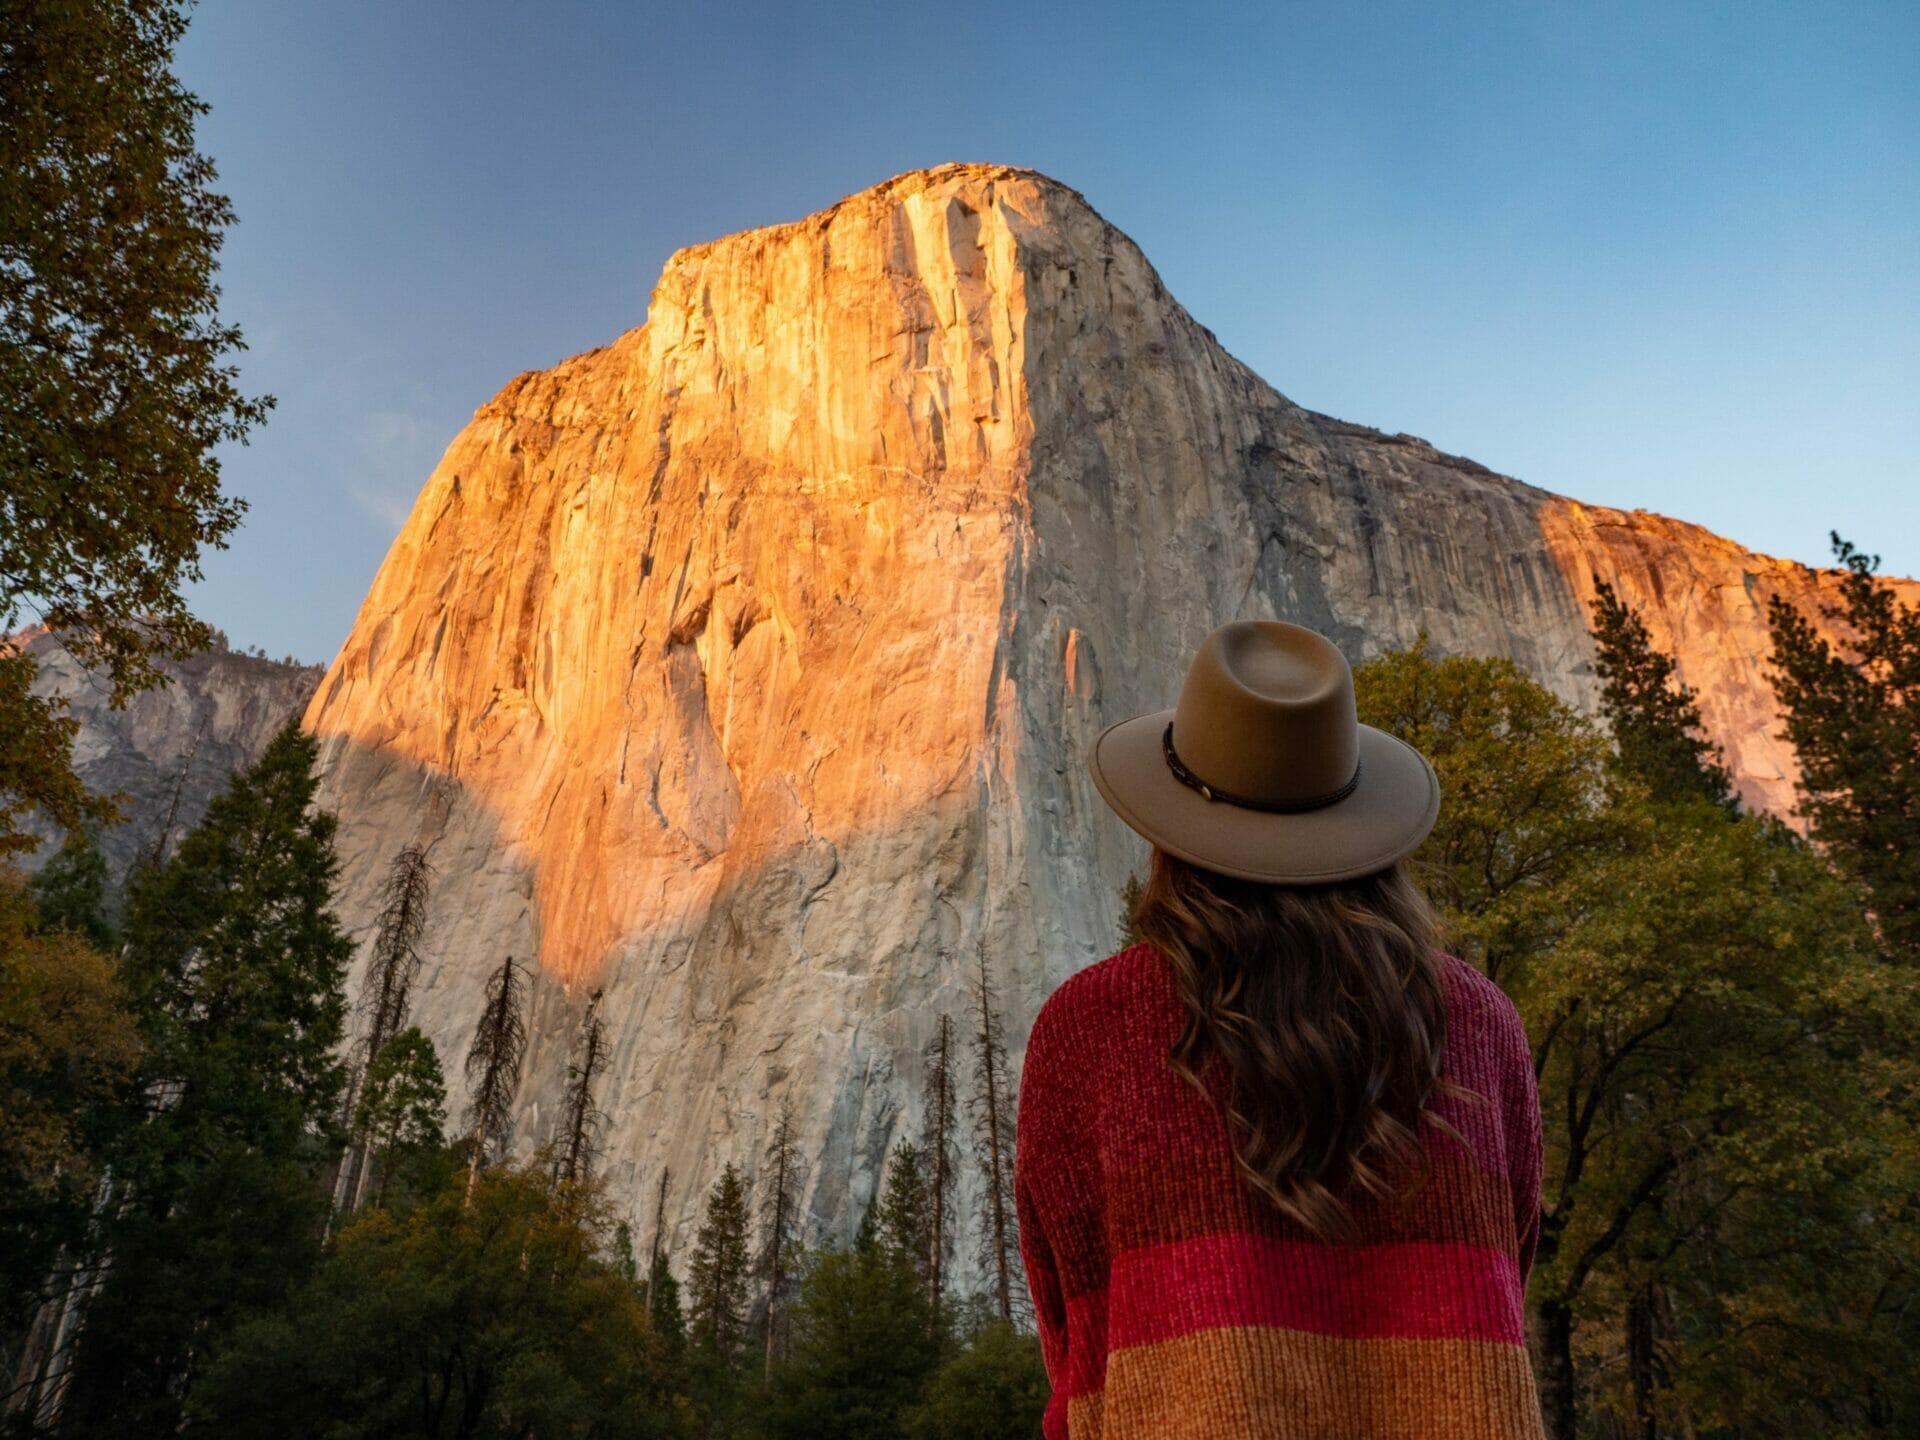 Yosemite National Park 1-day itinerary best views hikes